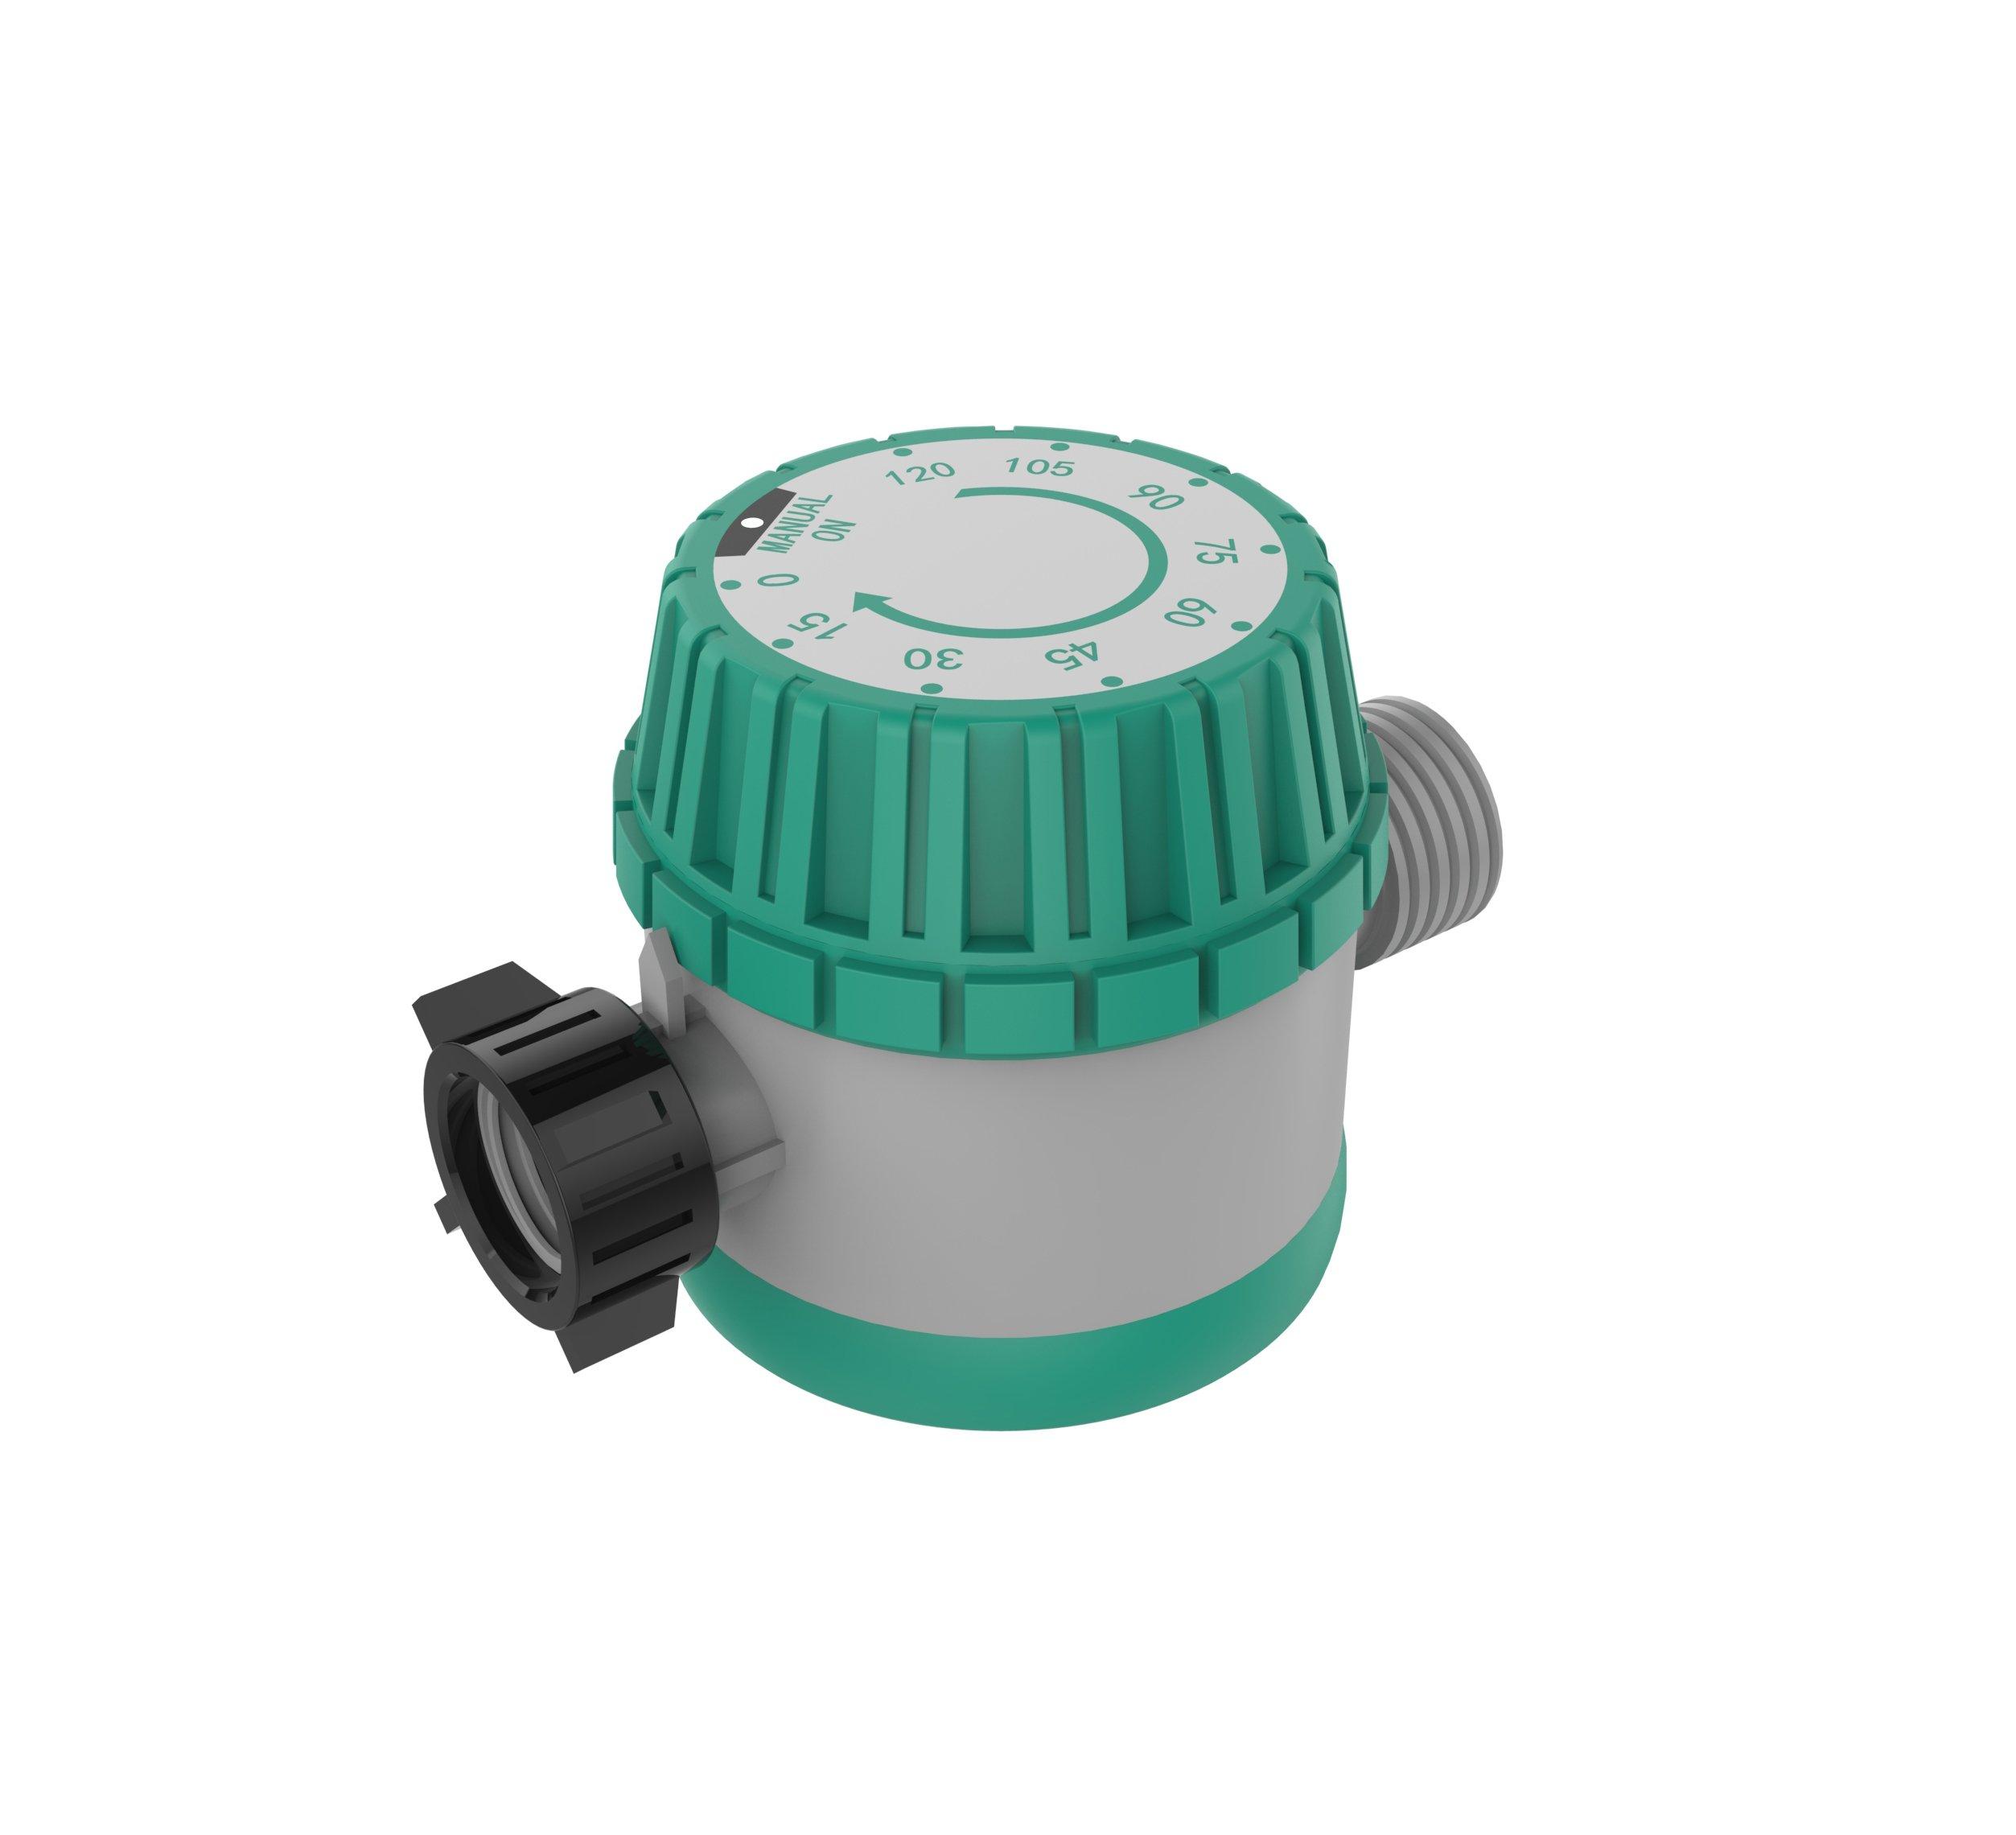 Dorable Garden Hose Faucet Mold - Faucet Products - austinmartin.us